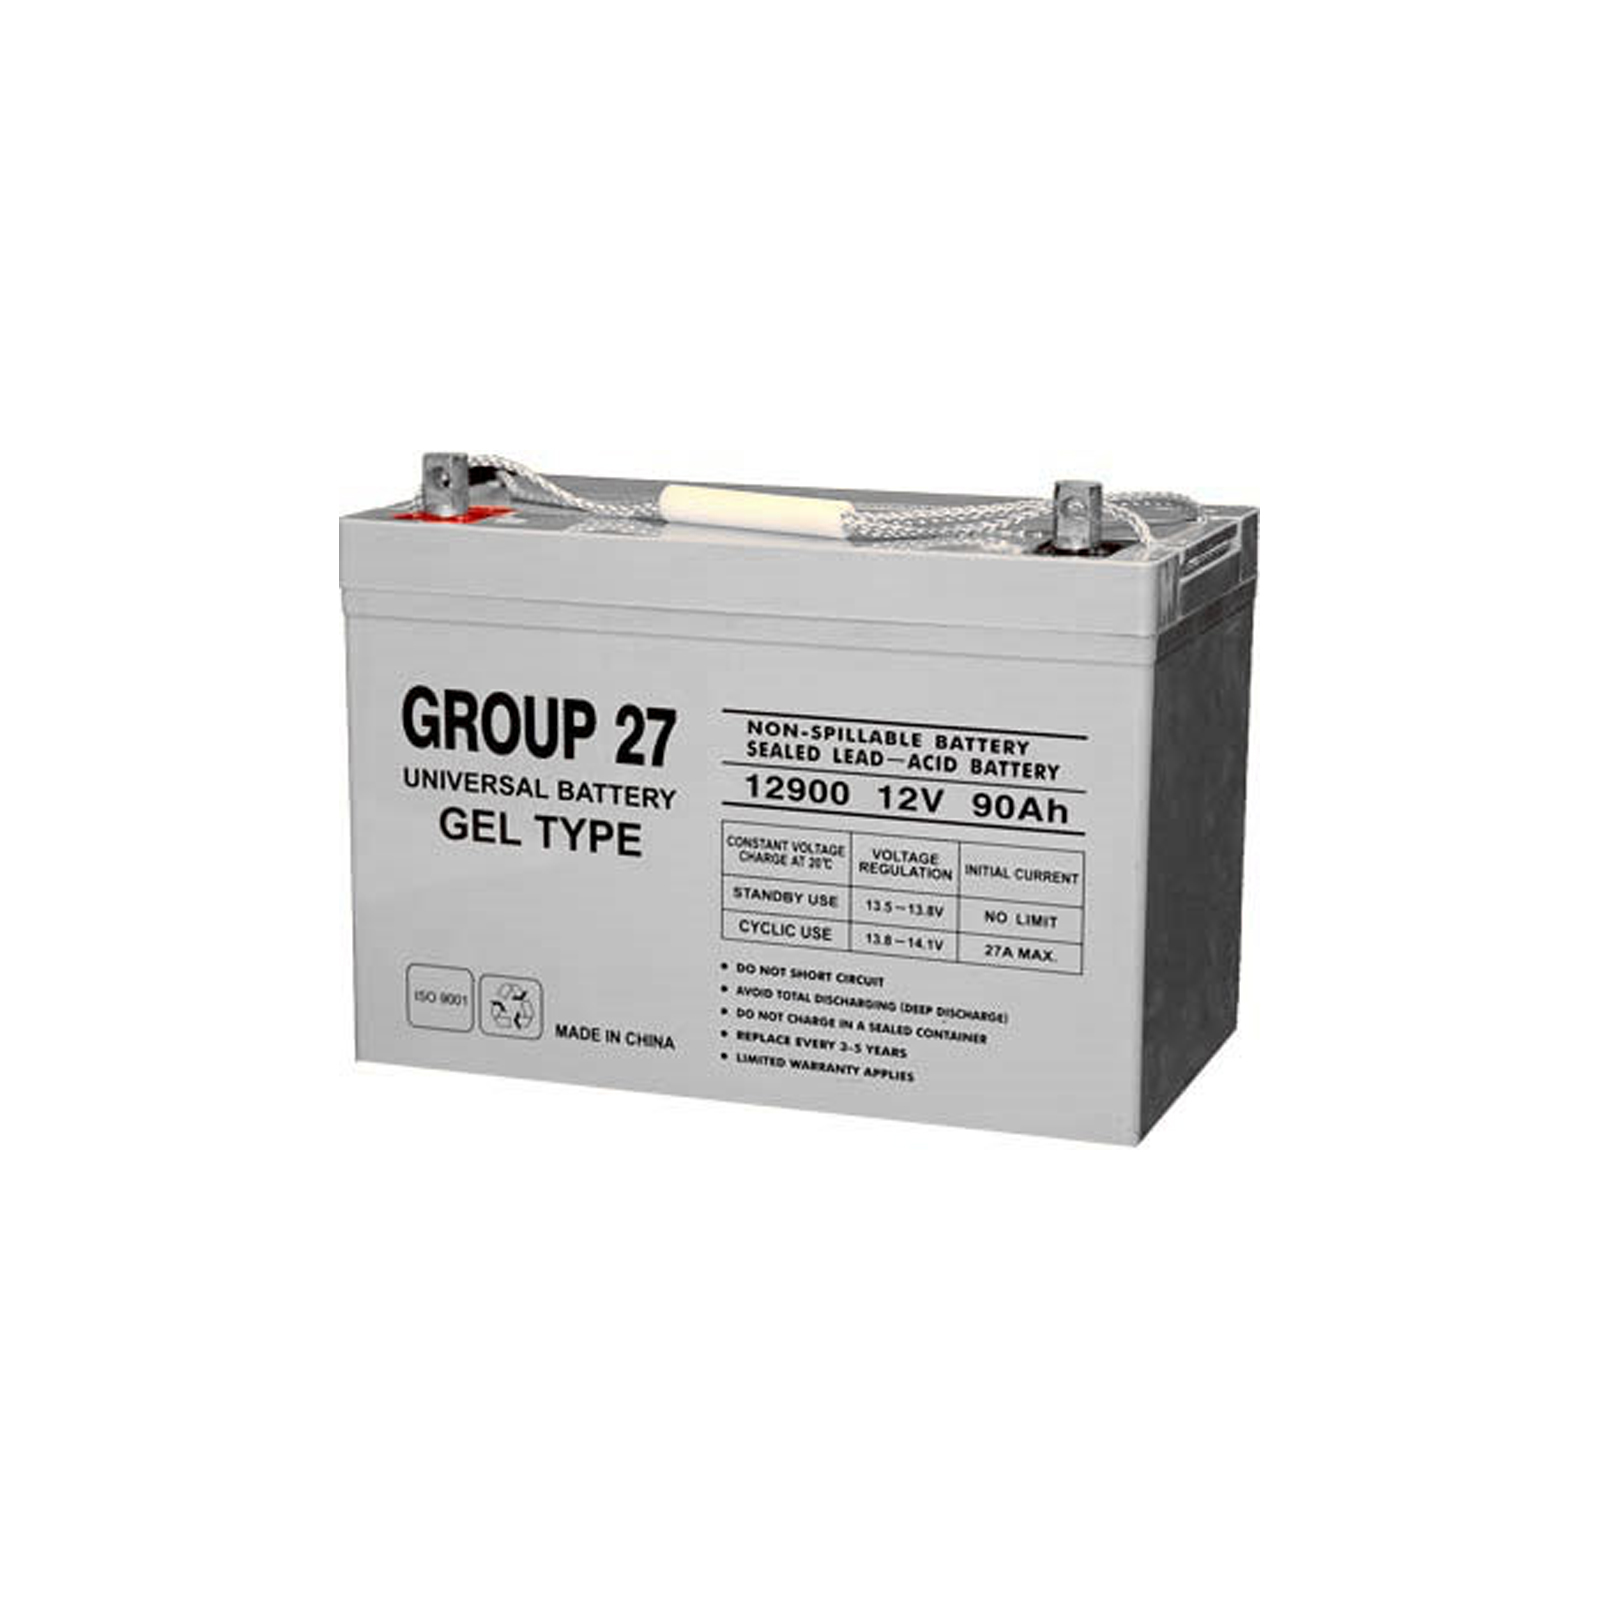 Sealed Lead Acid Battery on 12v 90ah Sealed Lead Acid Gel Cell Battery Ub27 D5873